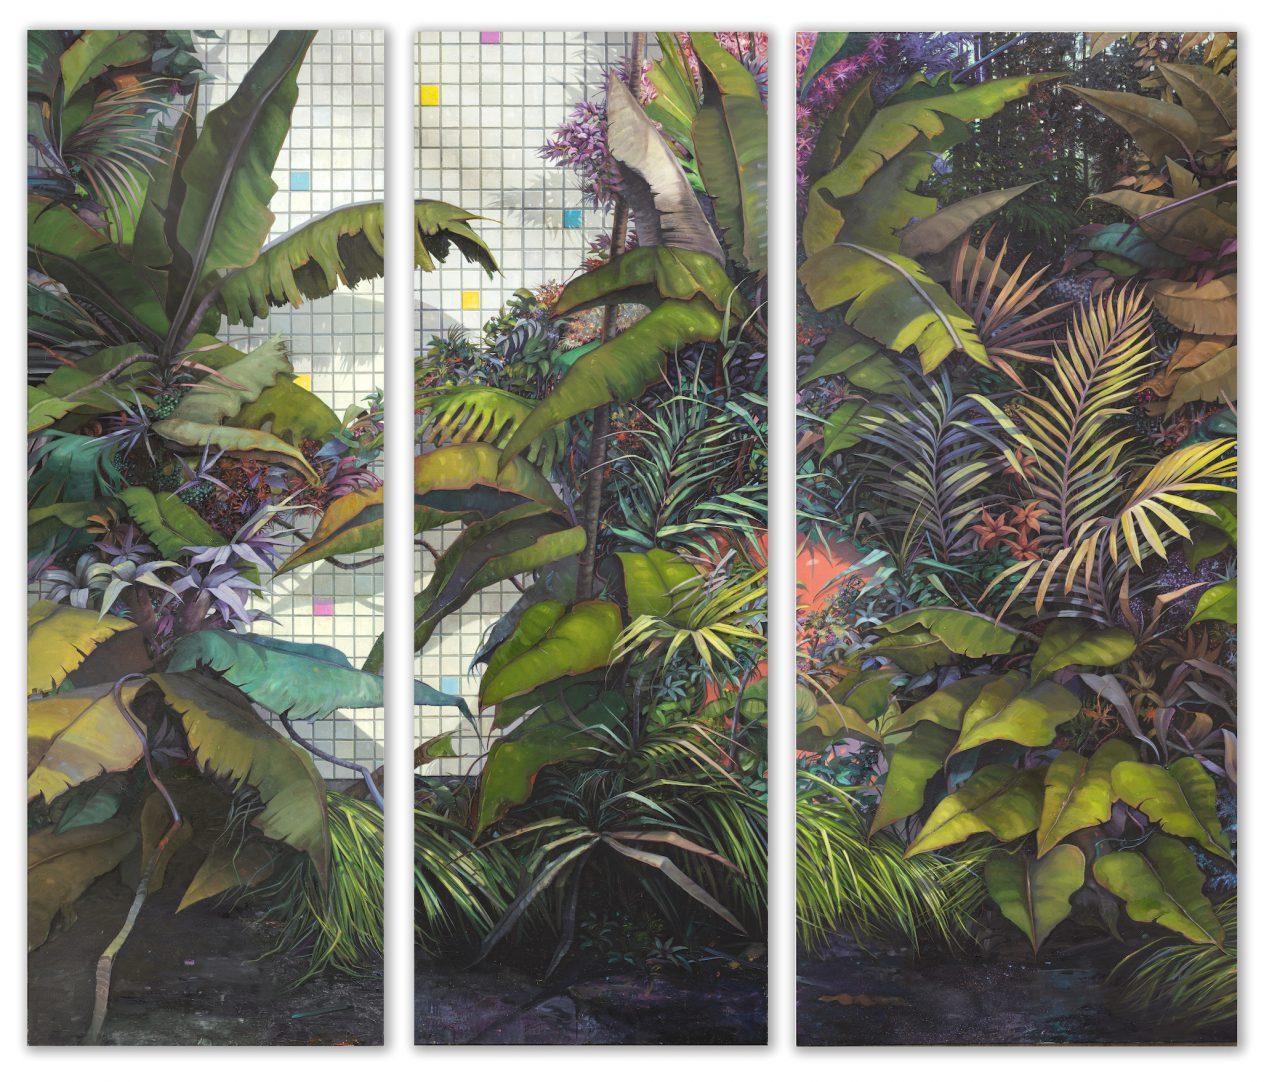 the garden / Ed in Arcadia ego - gesamt 300 x 340cm - Öl / Lw. - 2018